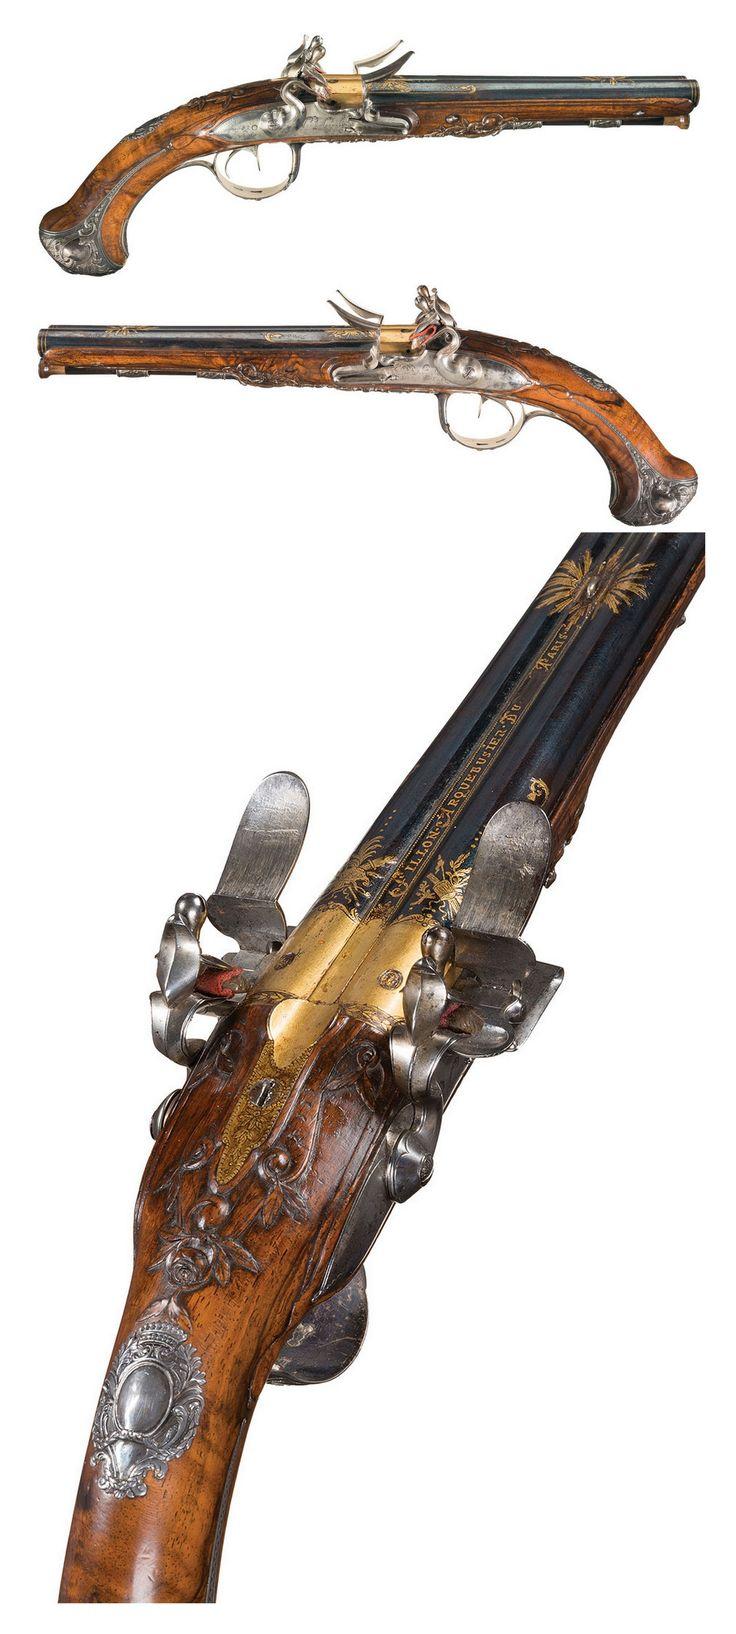 "Flint Lock clipart barrel French Paris"" 20+ pistol du"